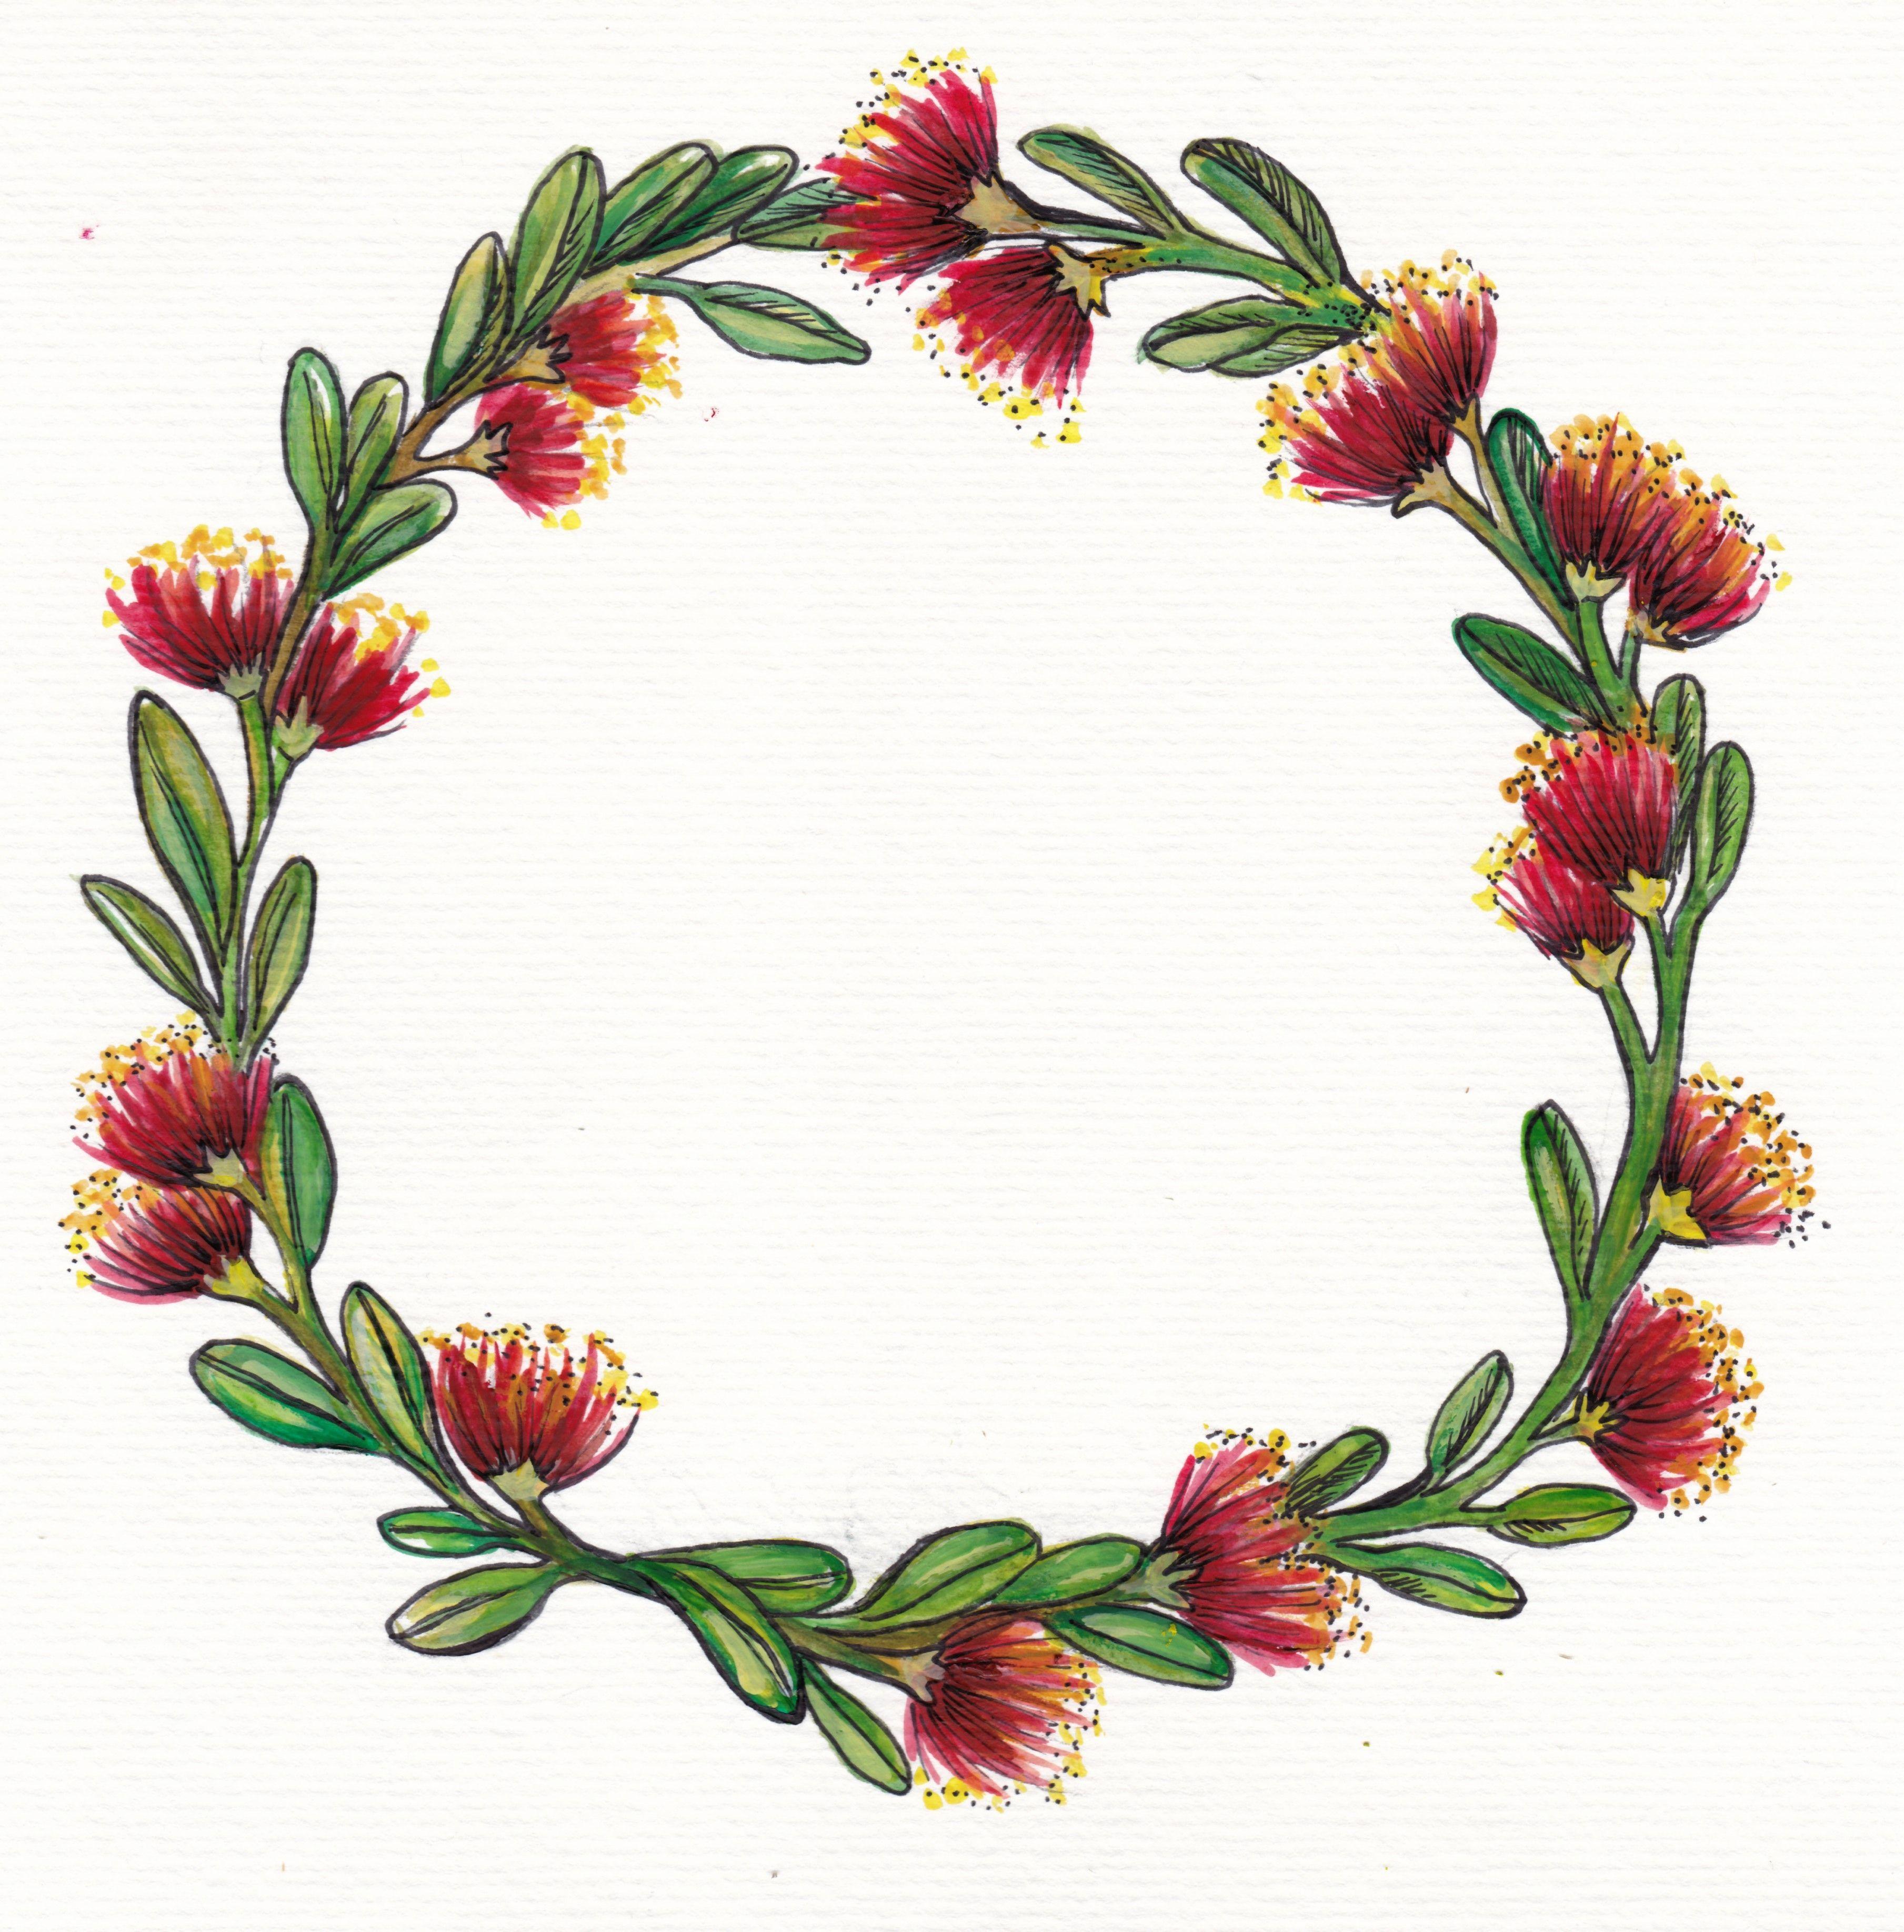 Pohutukawa Christmas Wreath #pohutukawawreath.